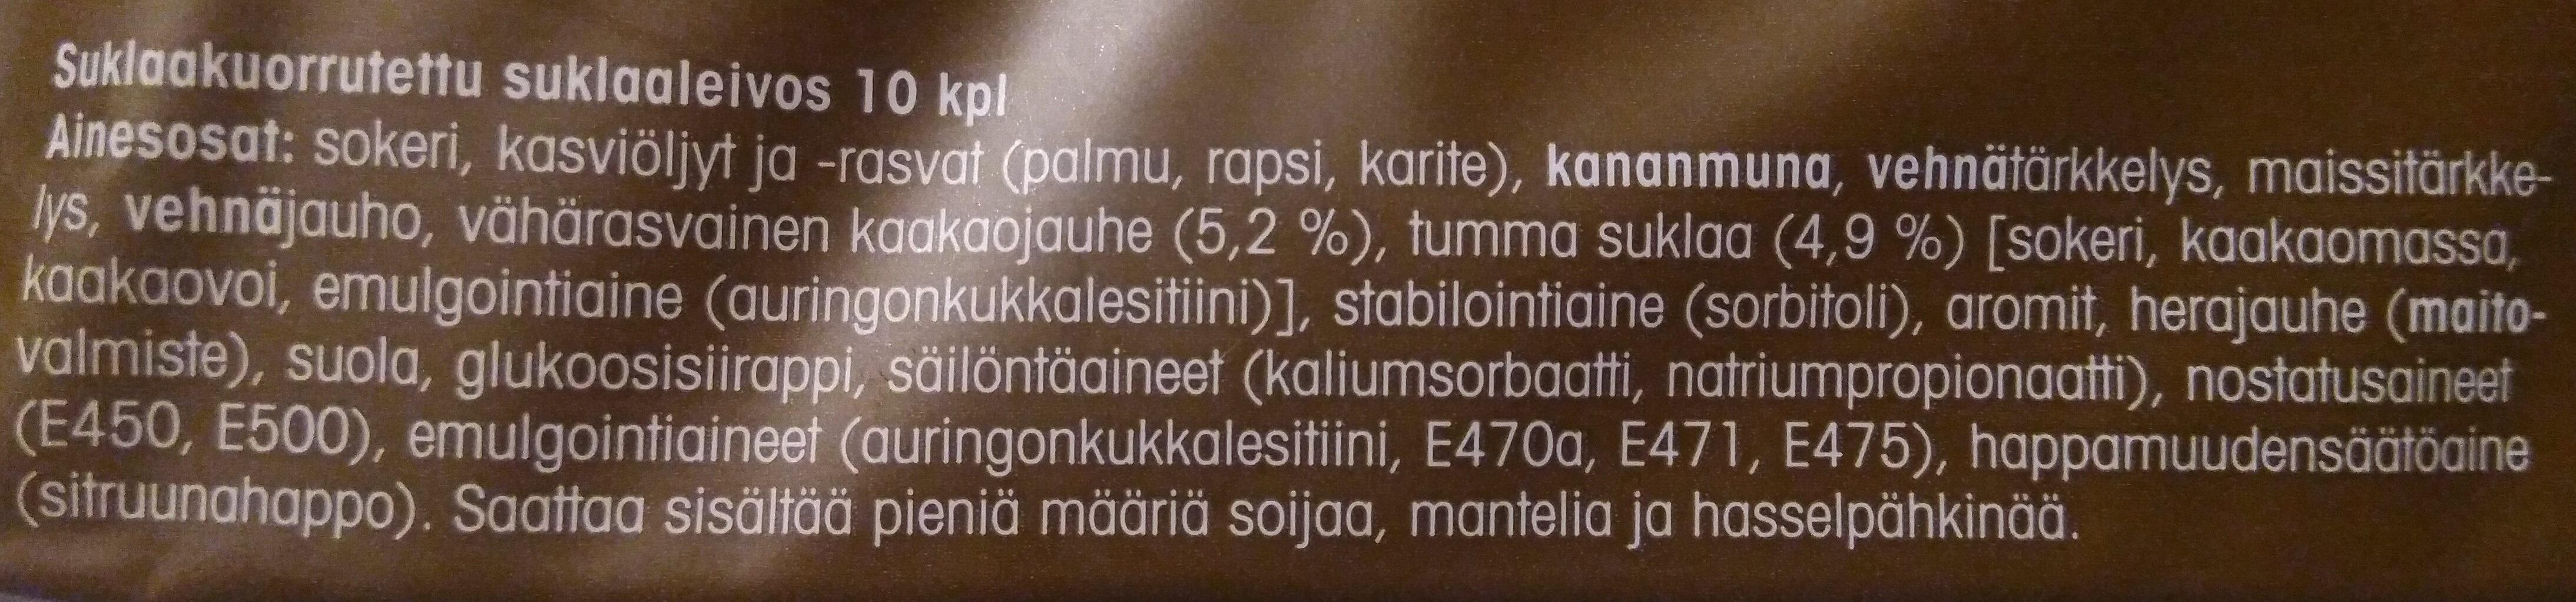 Pieni suklaaleivos - Ingrédients - fi